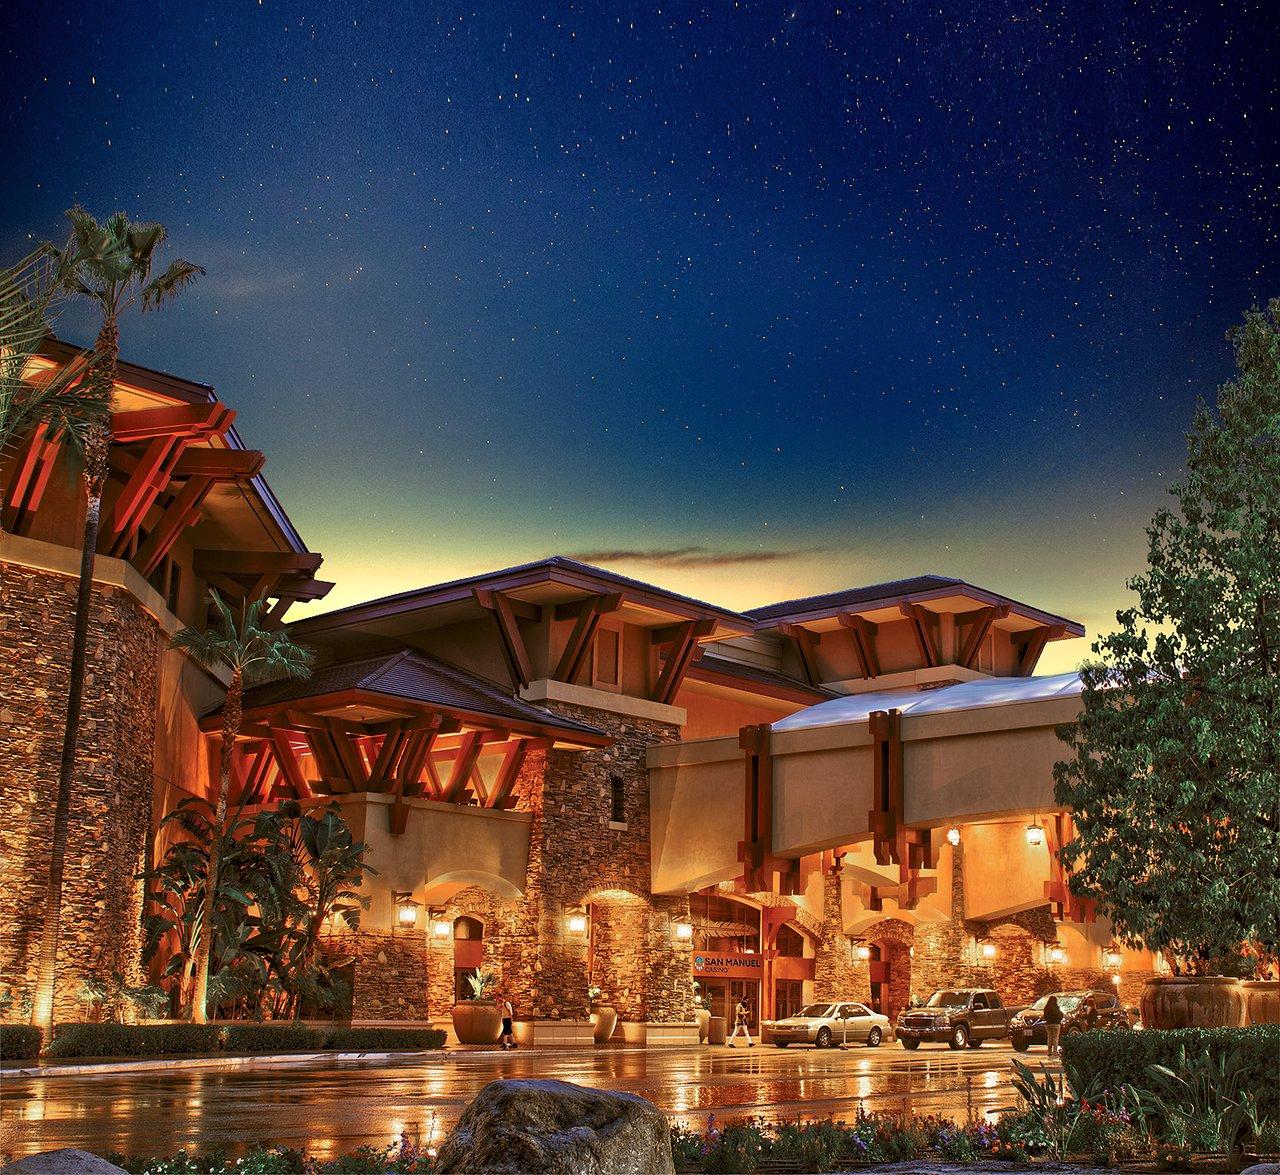 california casino indian manuel san